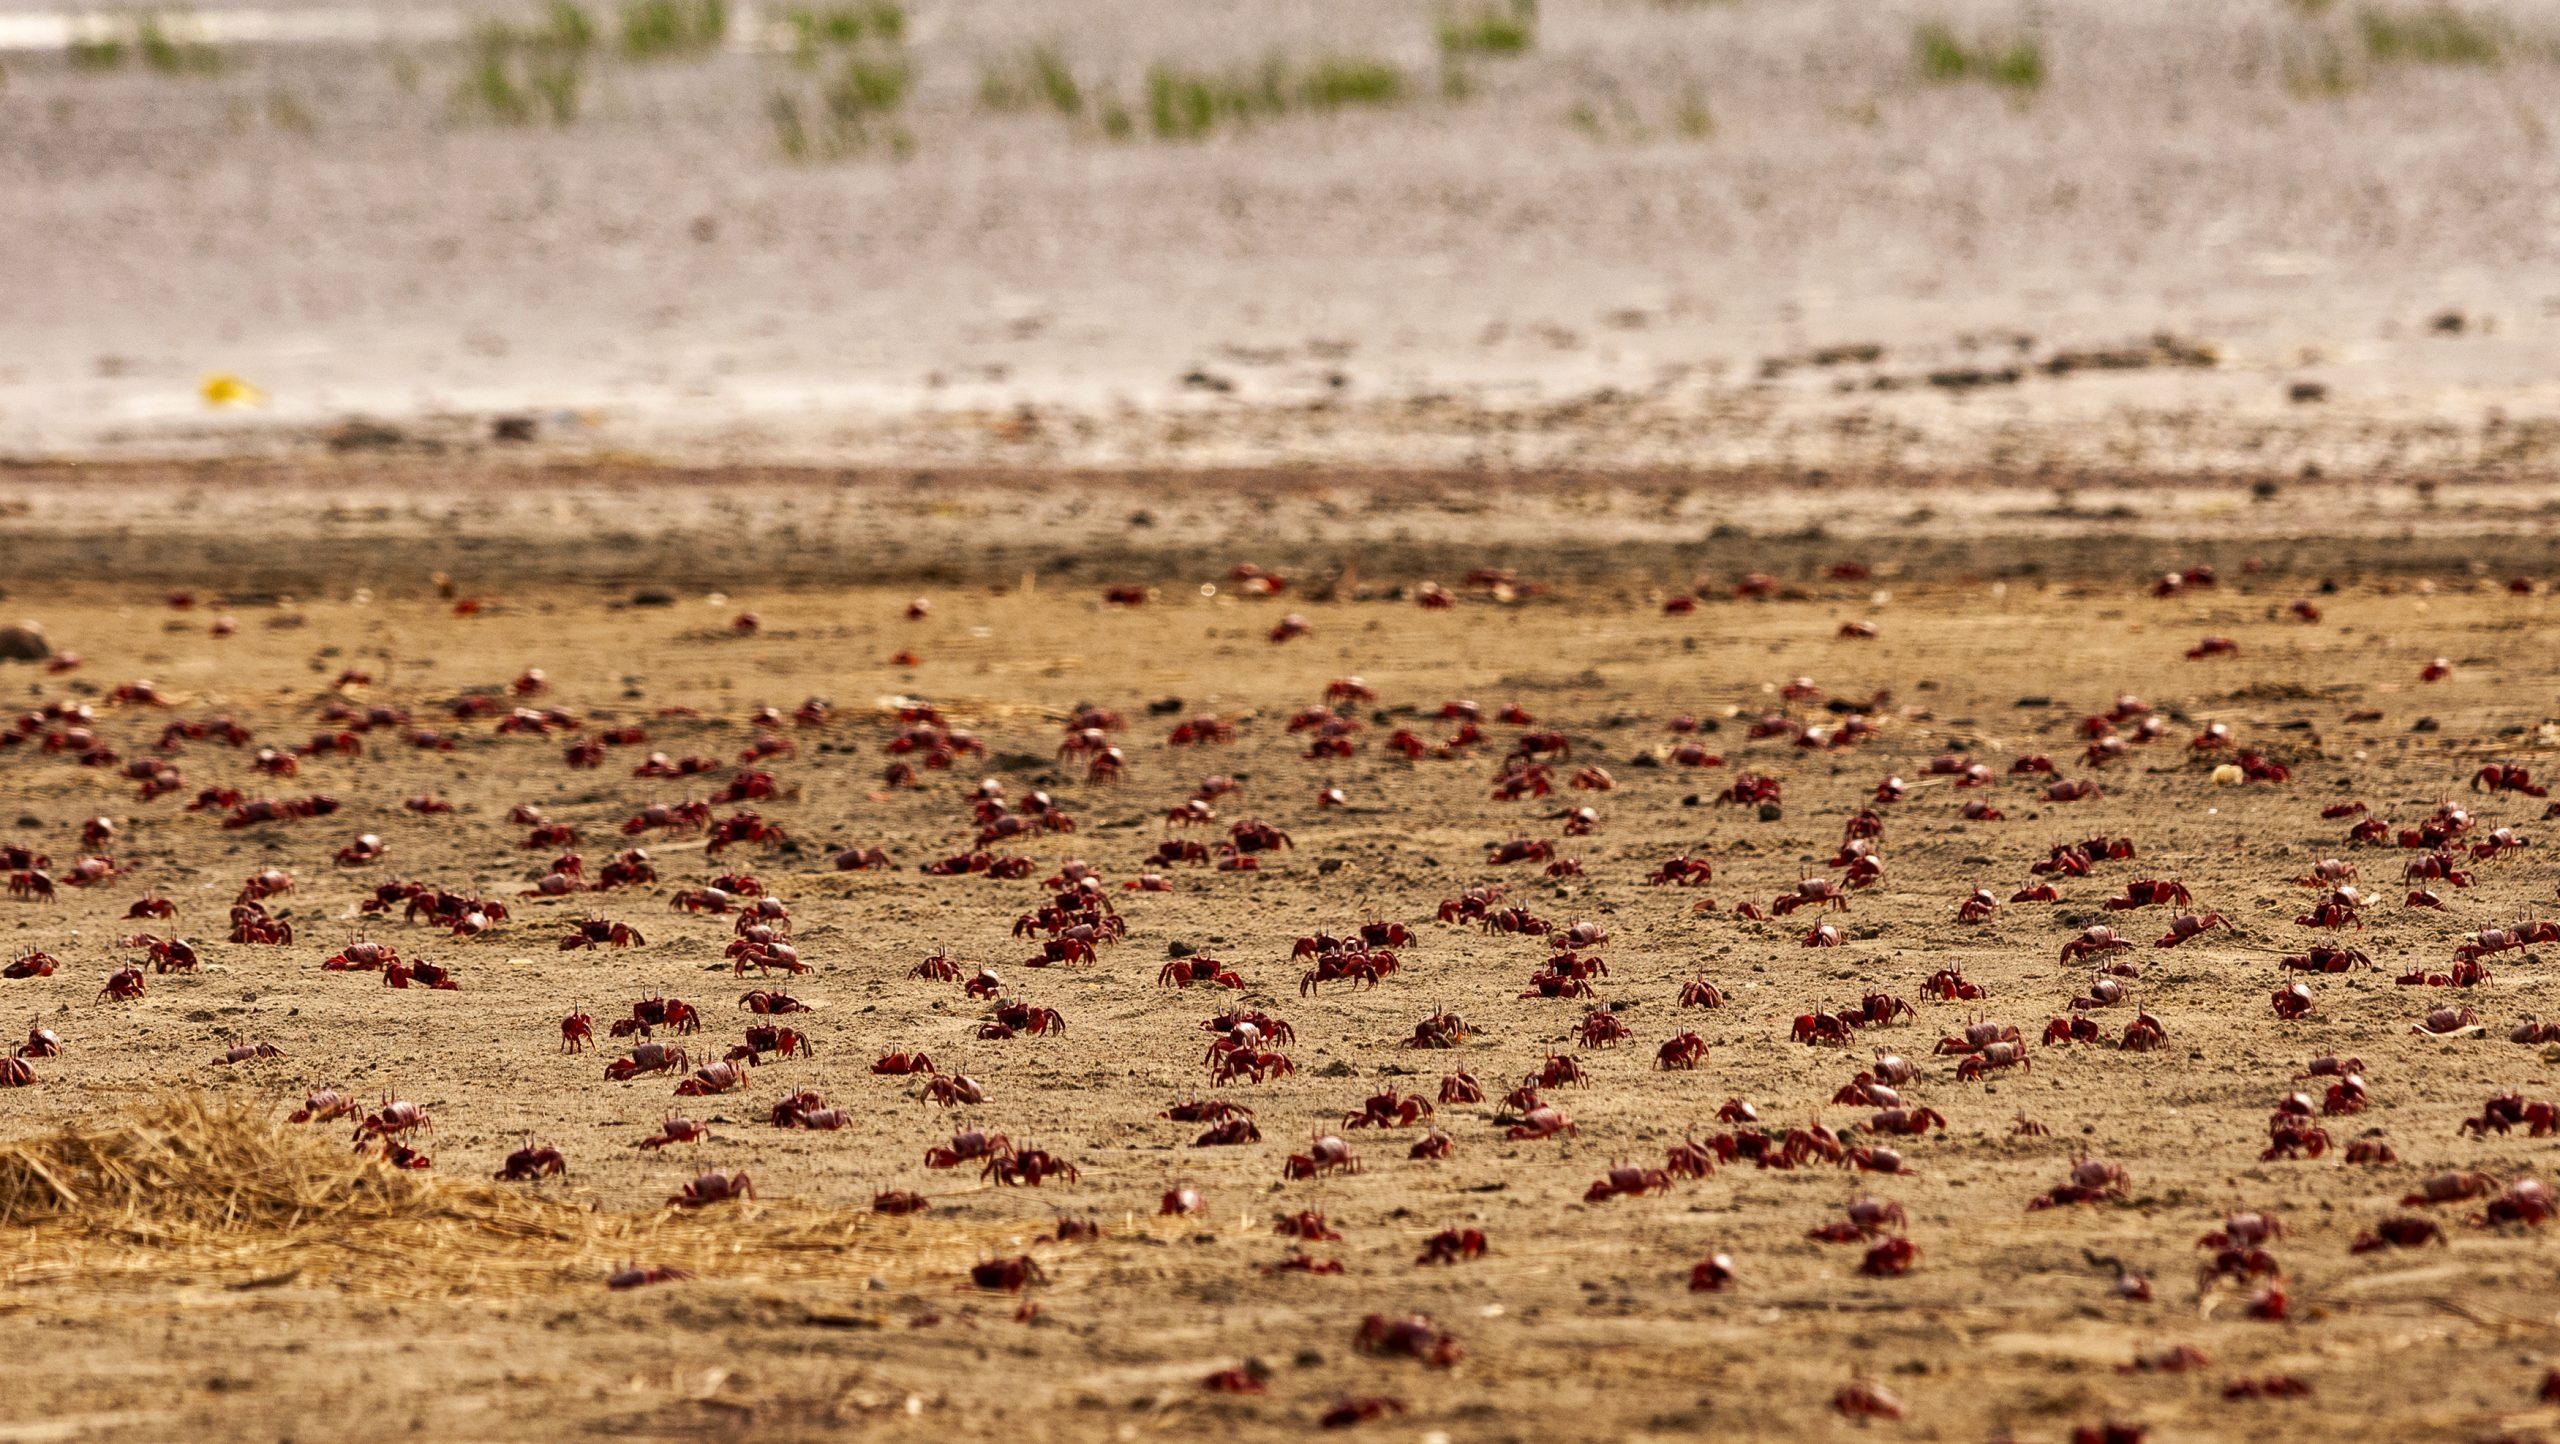 Red Crabs at Tajpur